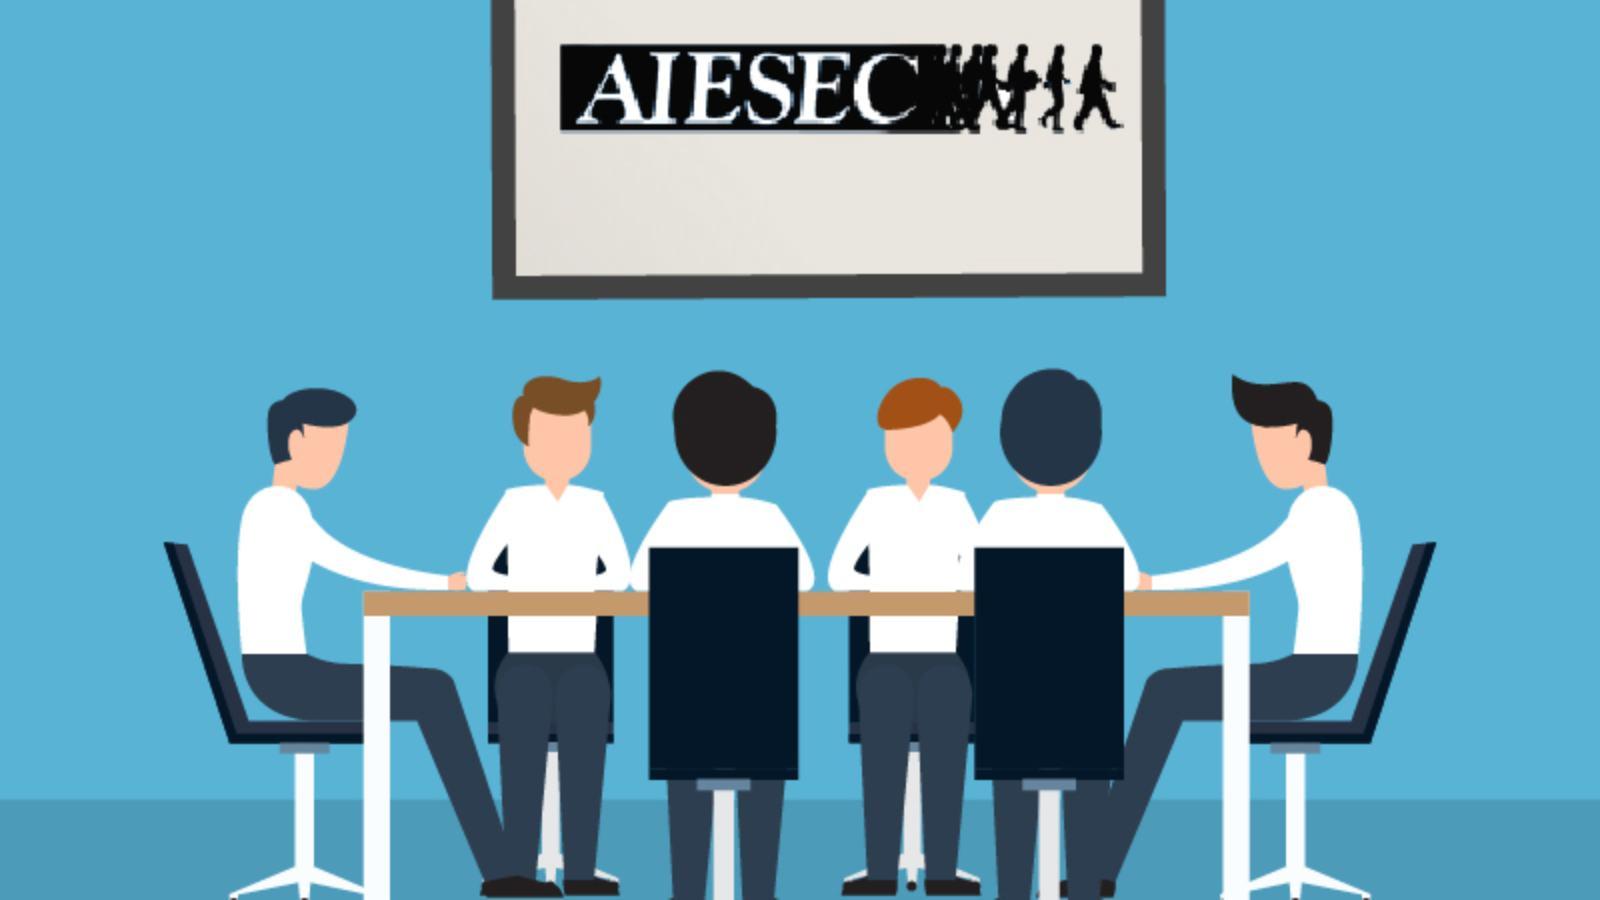 aiesec-01